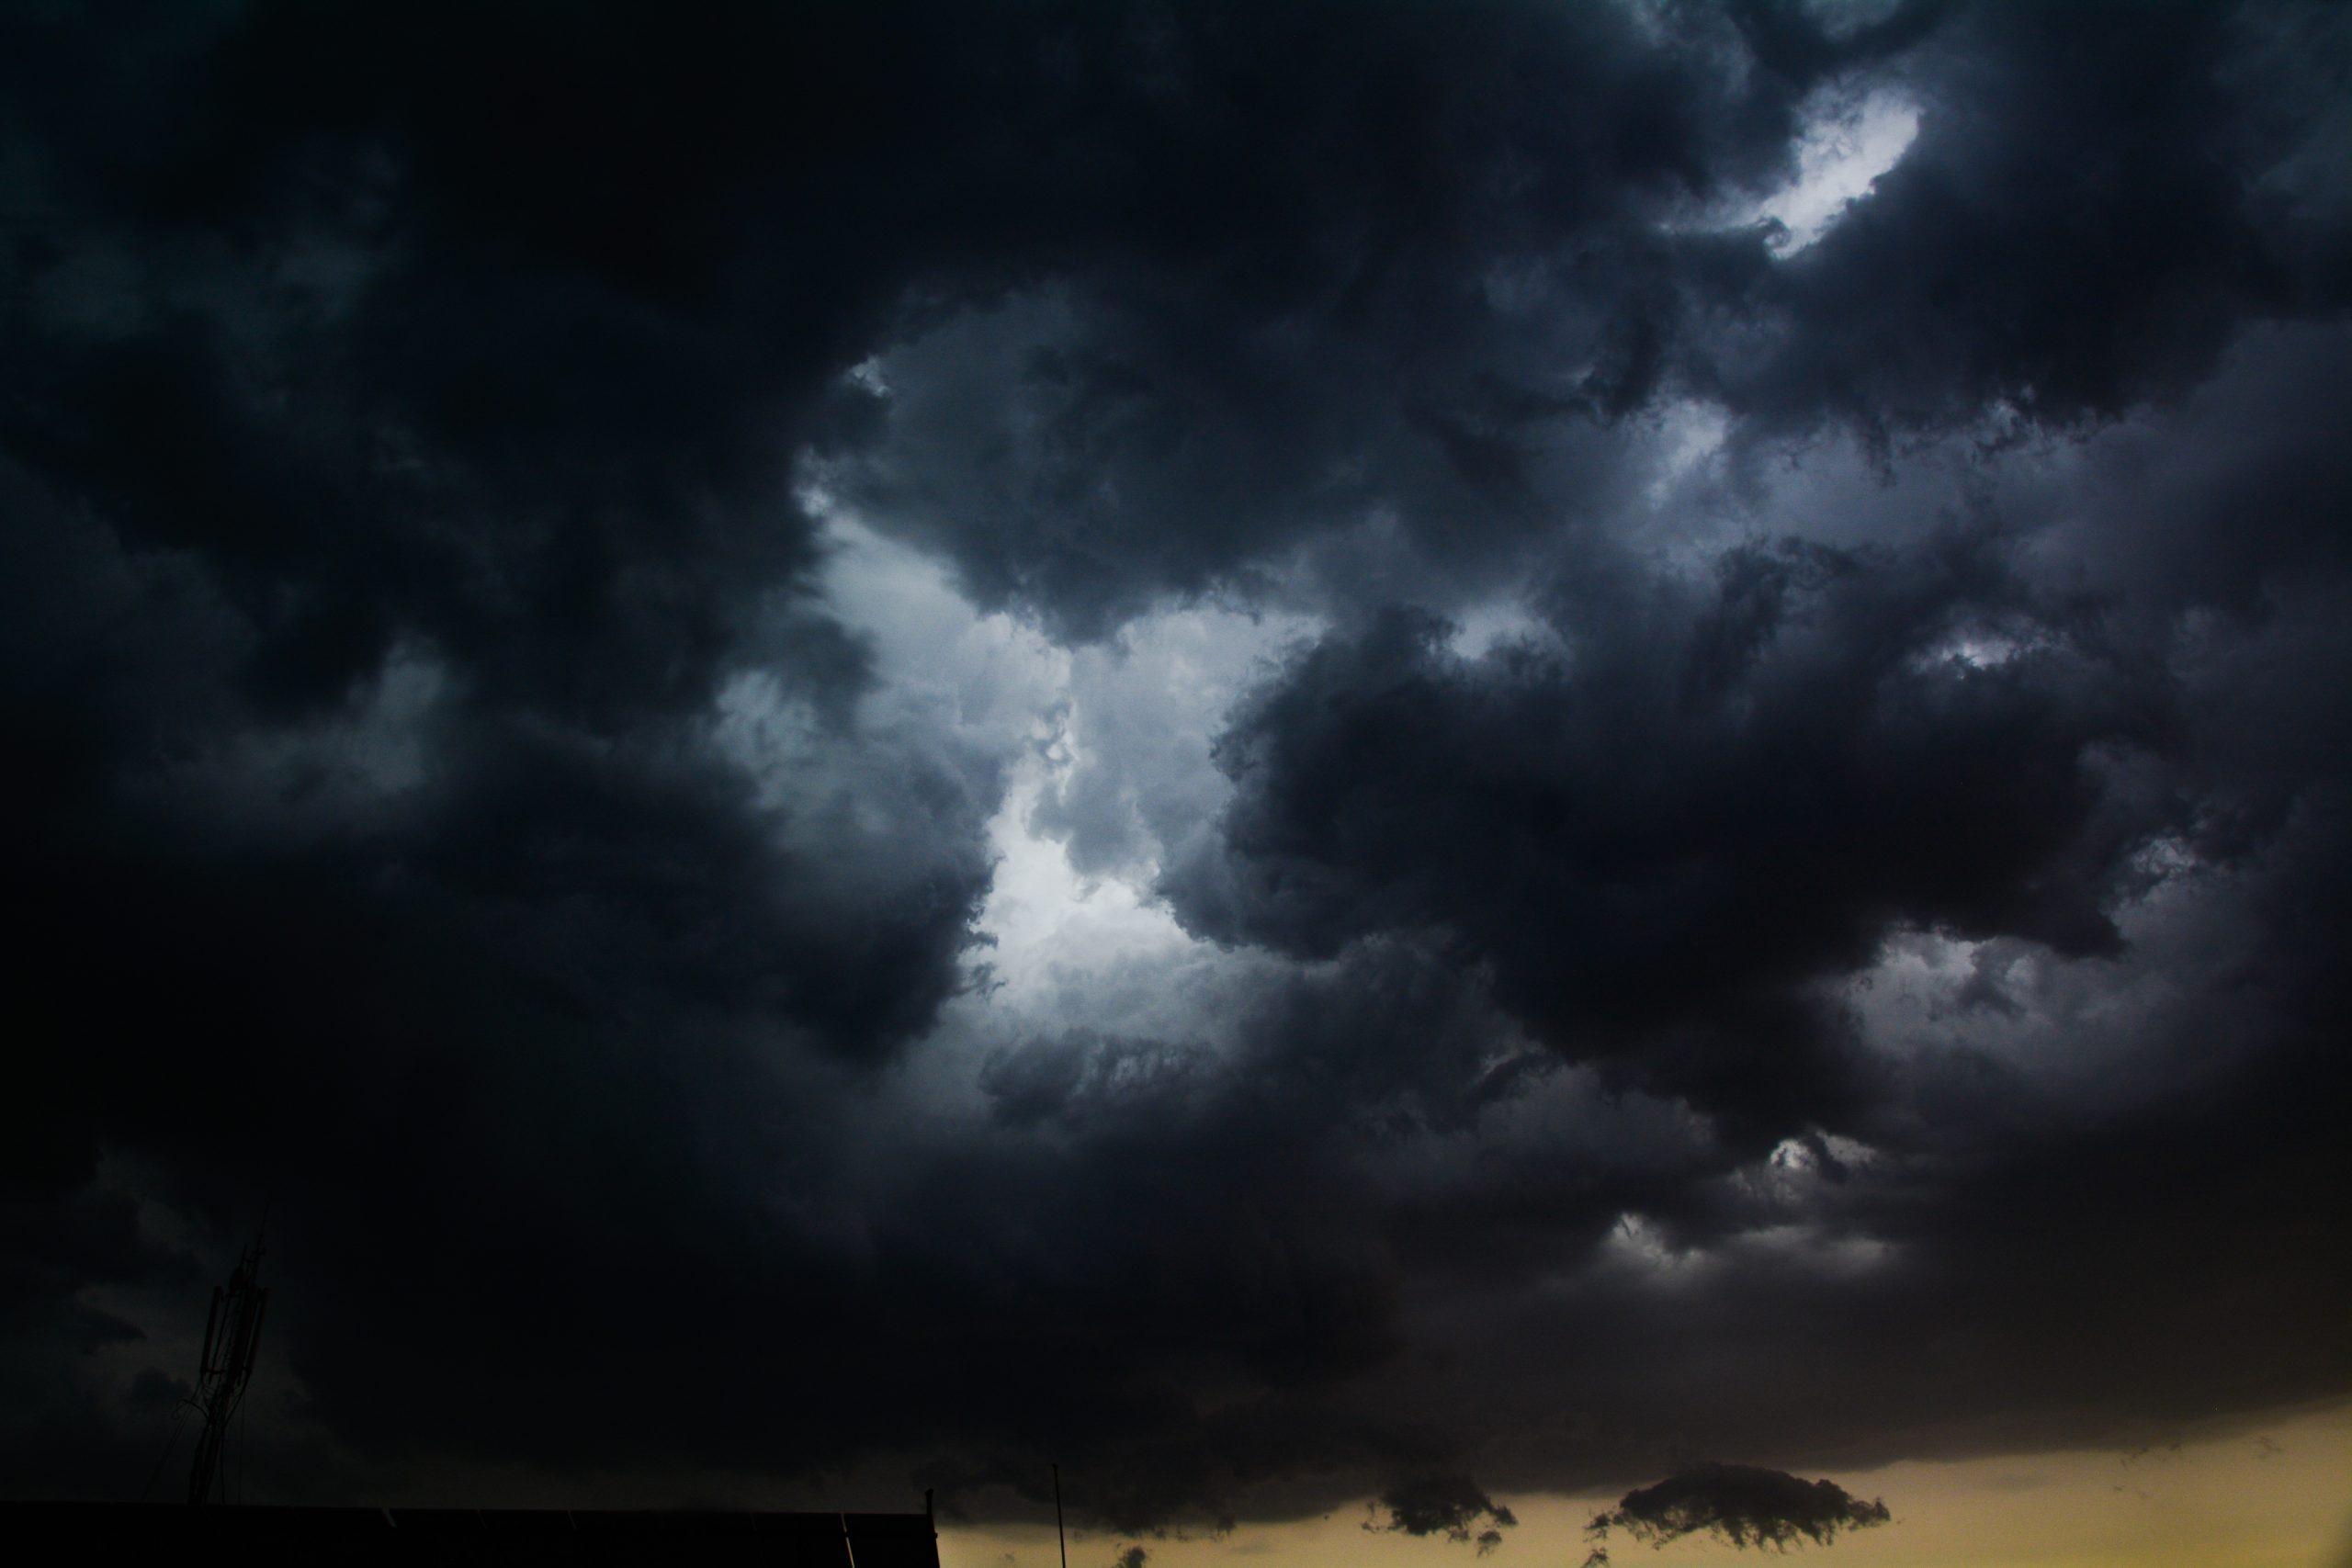 lightning of the thunder in between the moody dark sky.